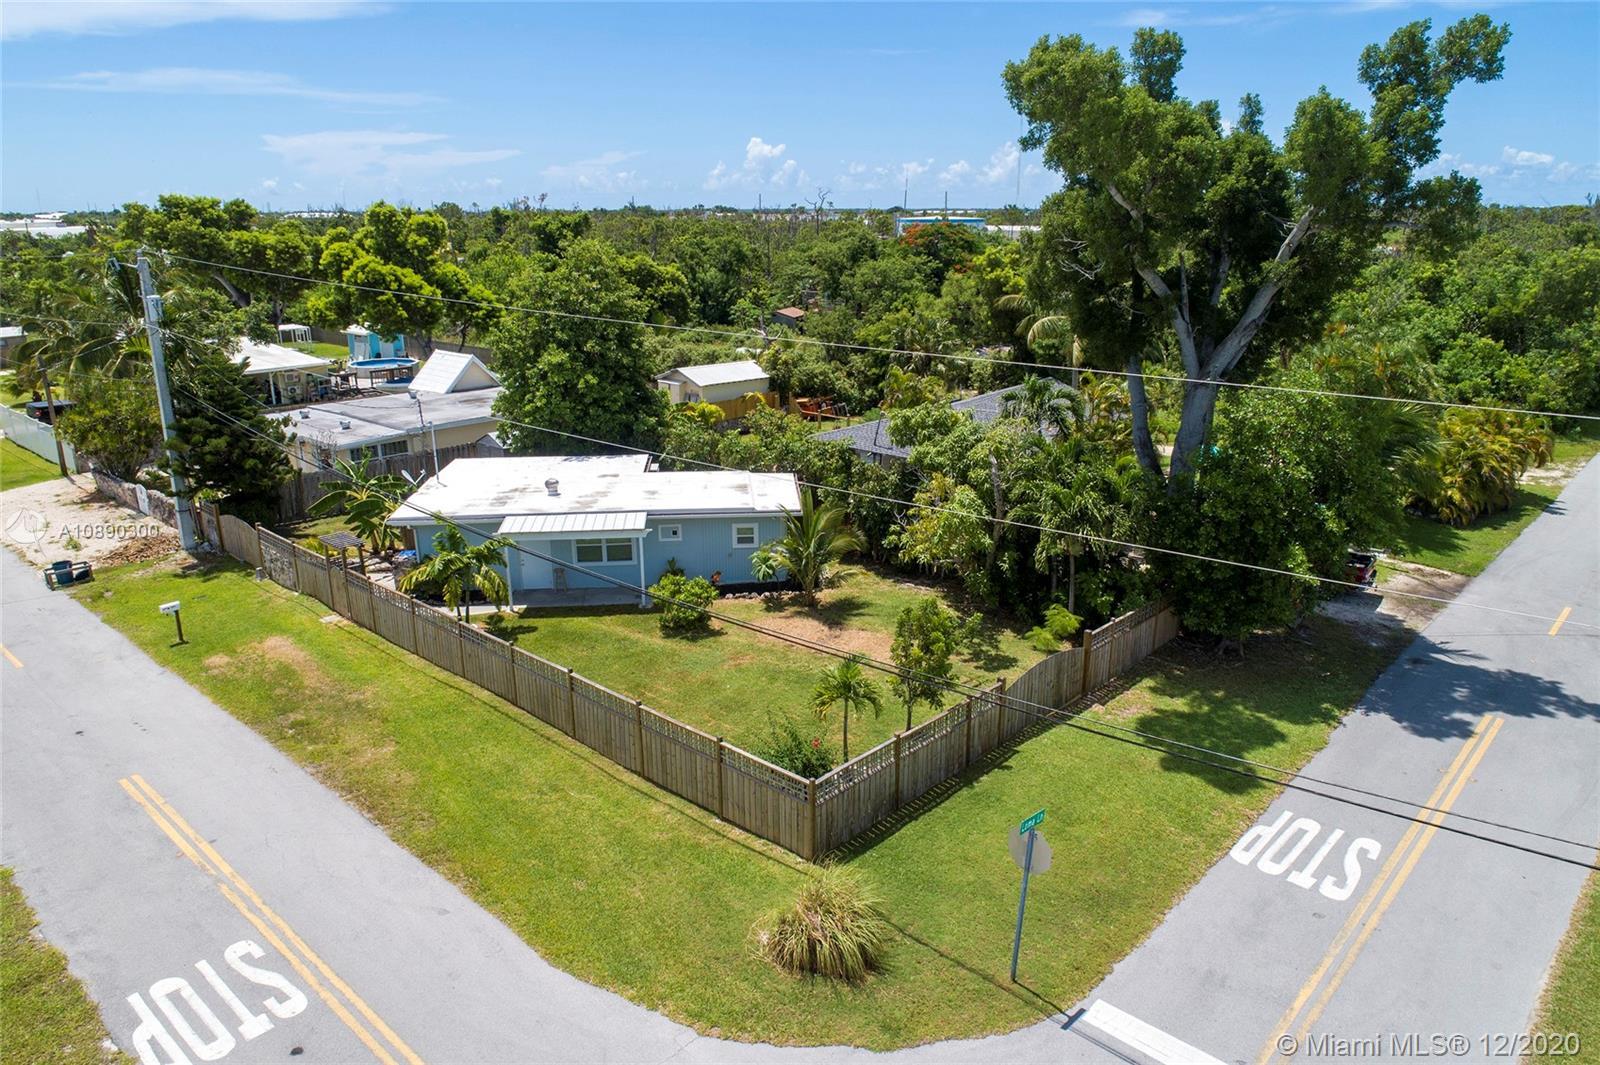 30120 Linda St Property Photo